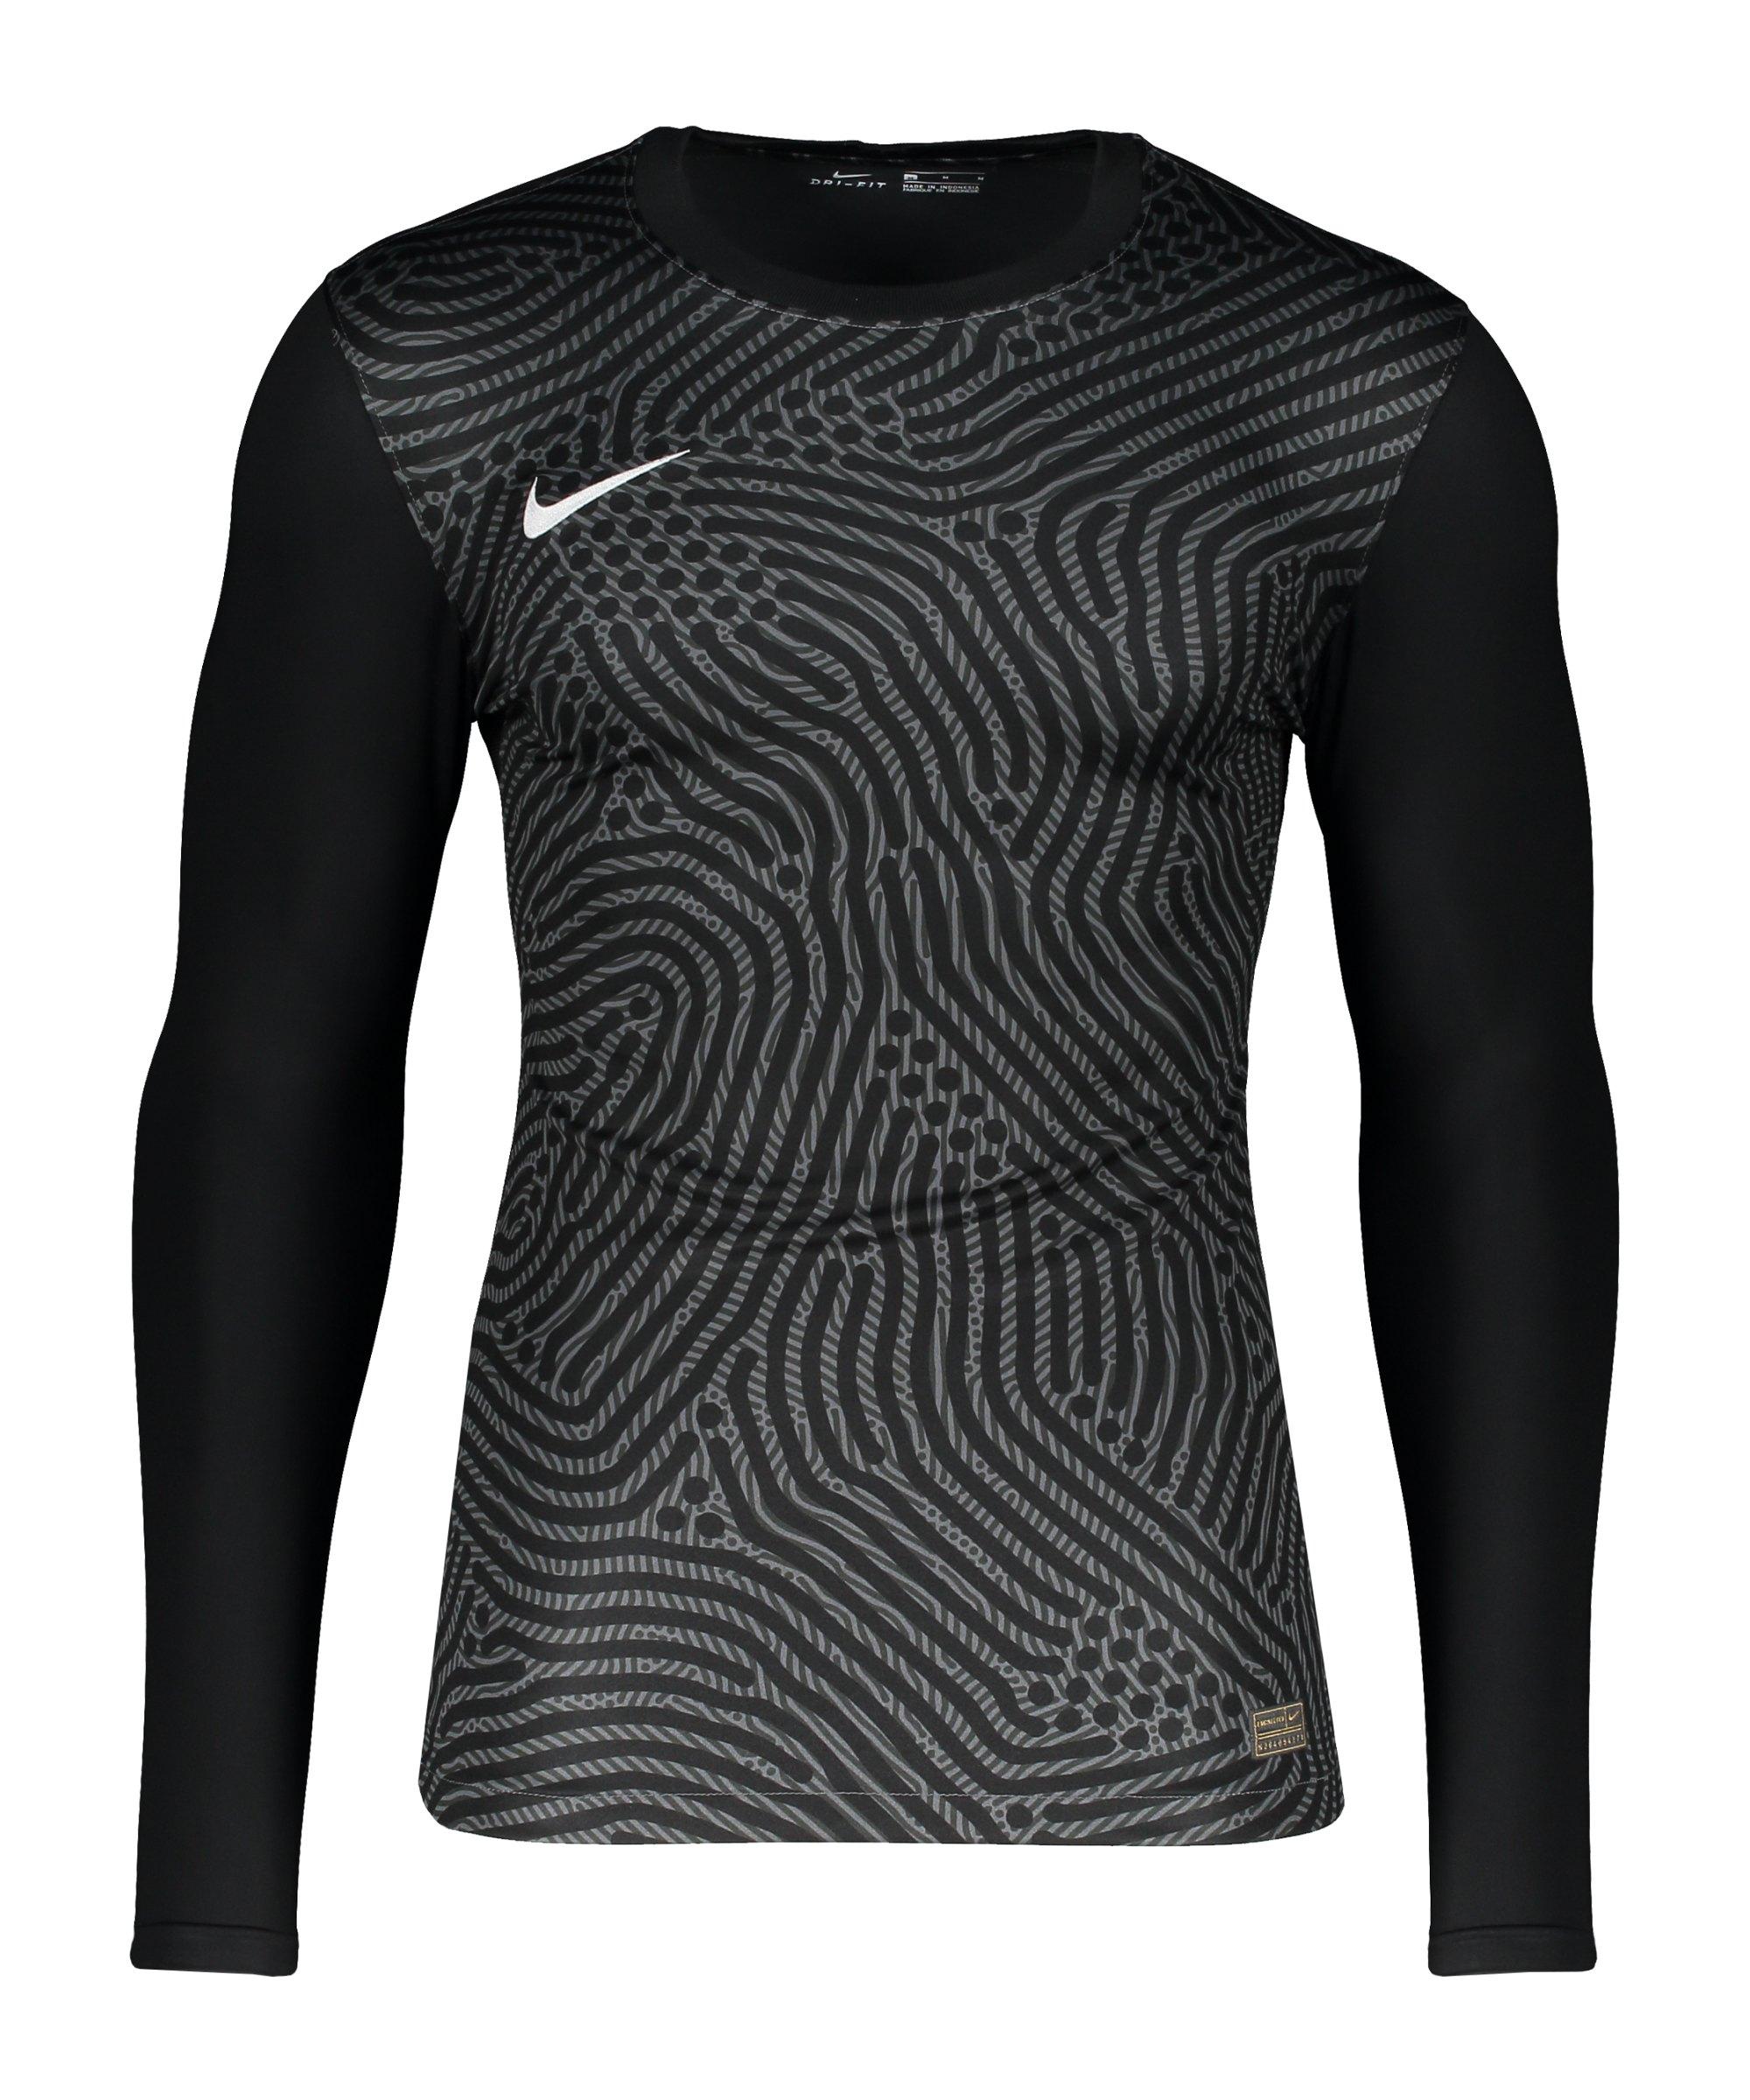 Nike Promo TW-Trikot langarm Schwarz Grau F021 - schwarz